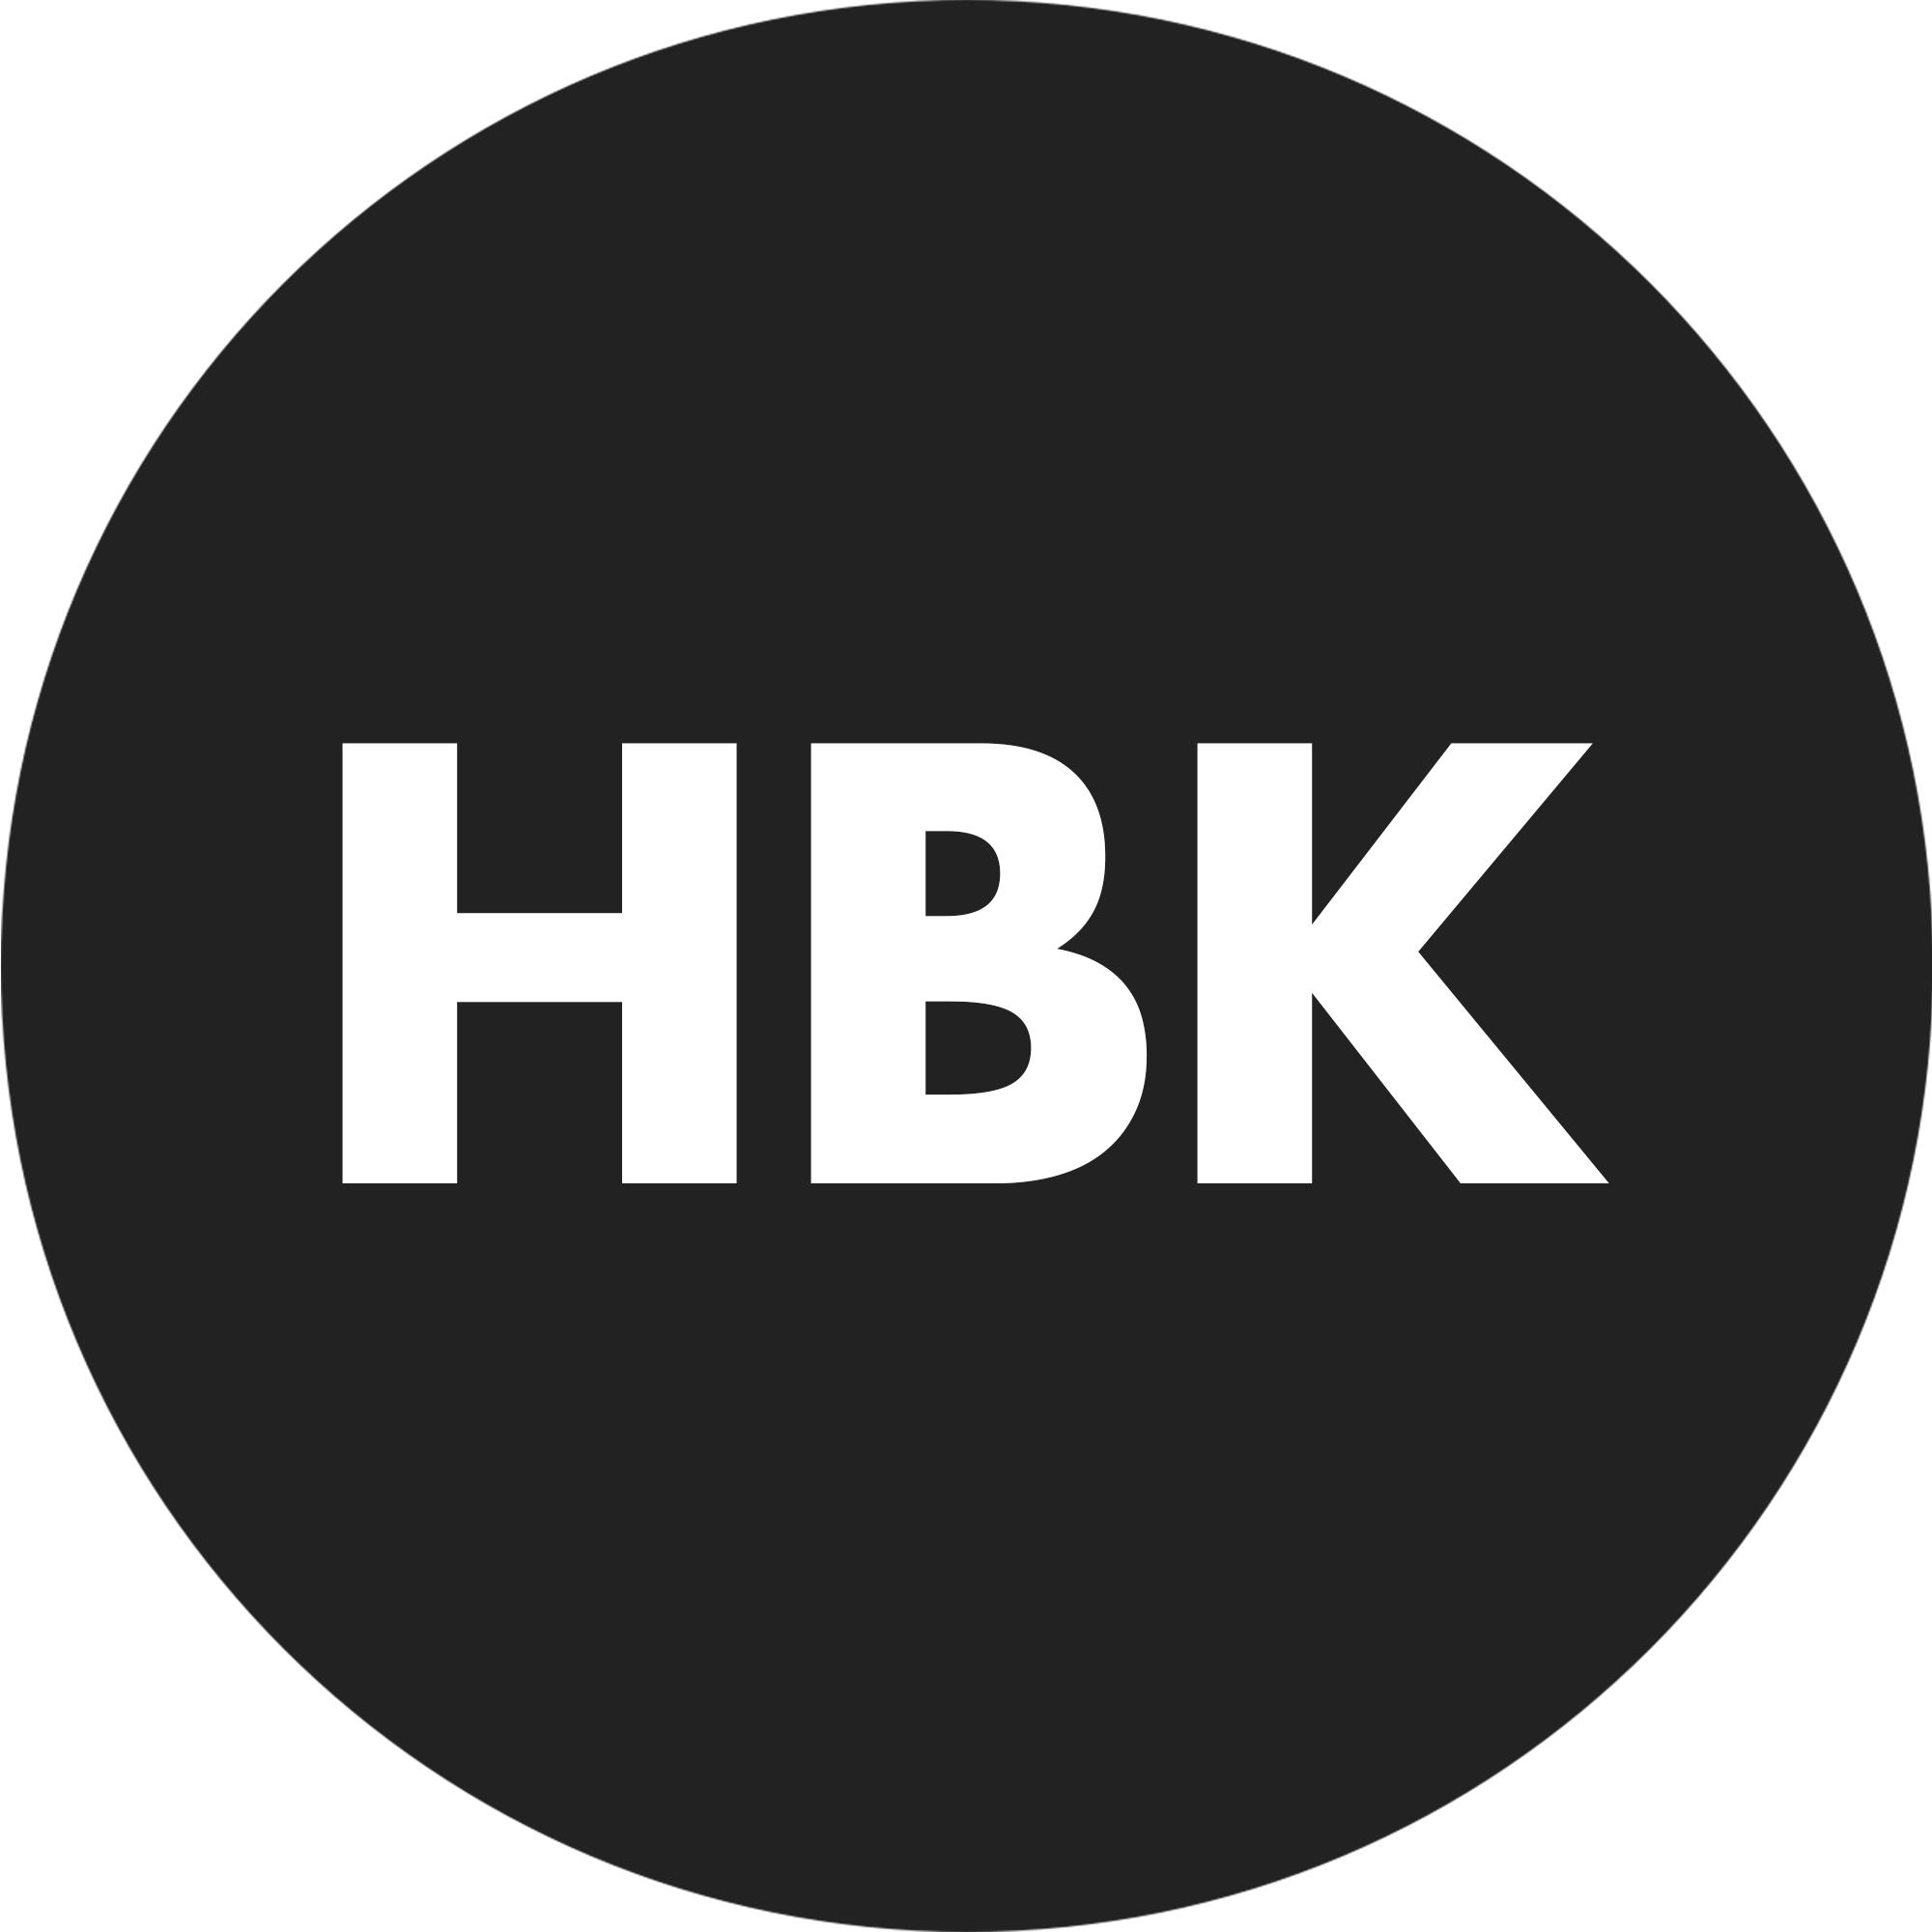 HBK.jpg